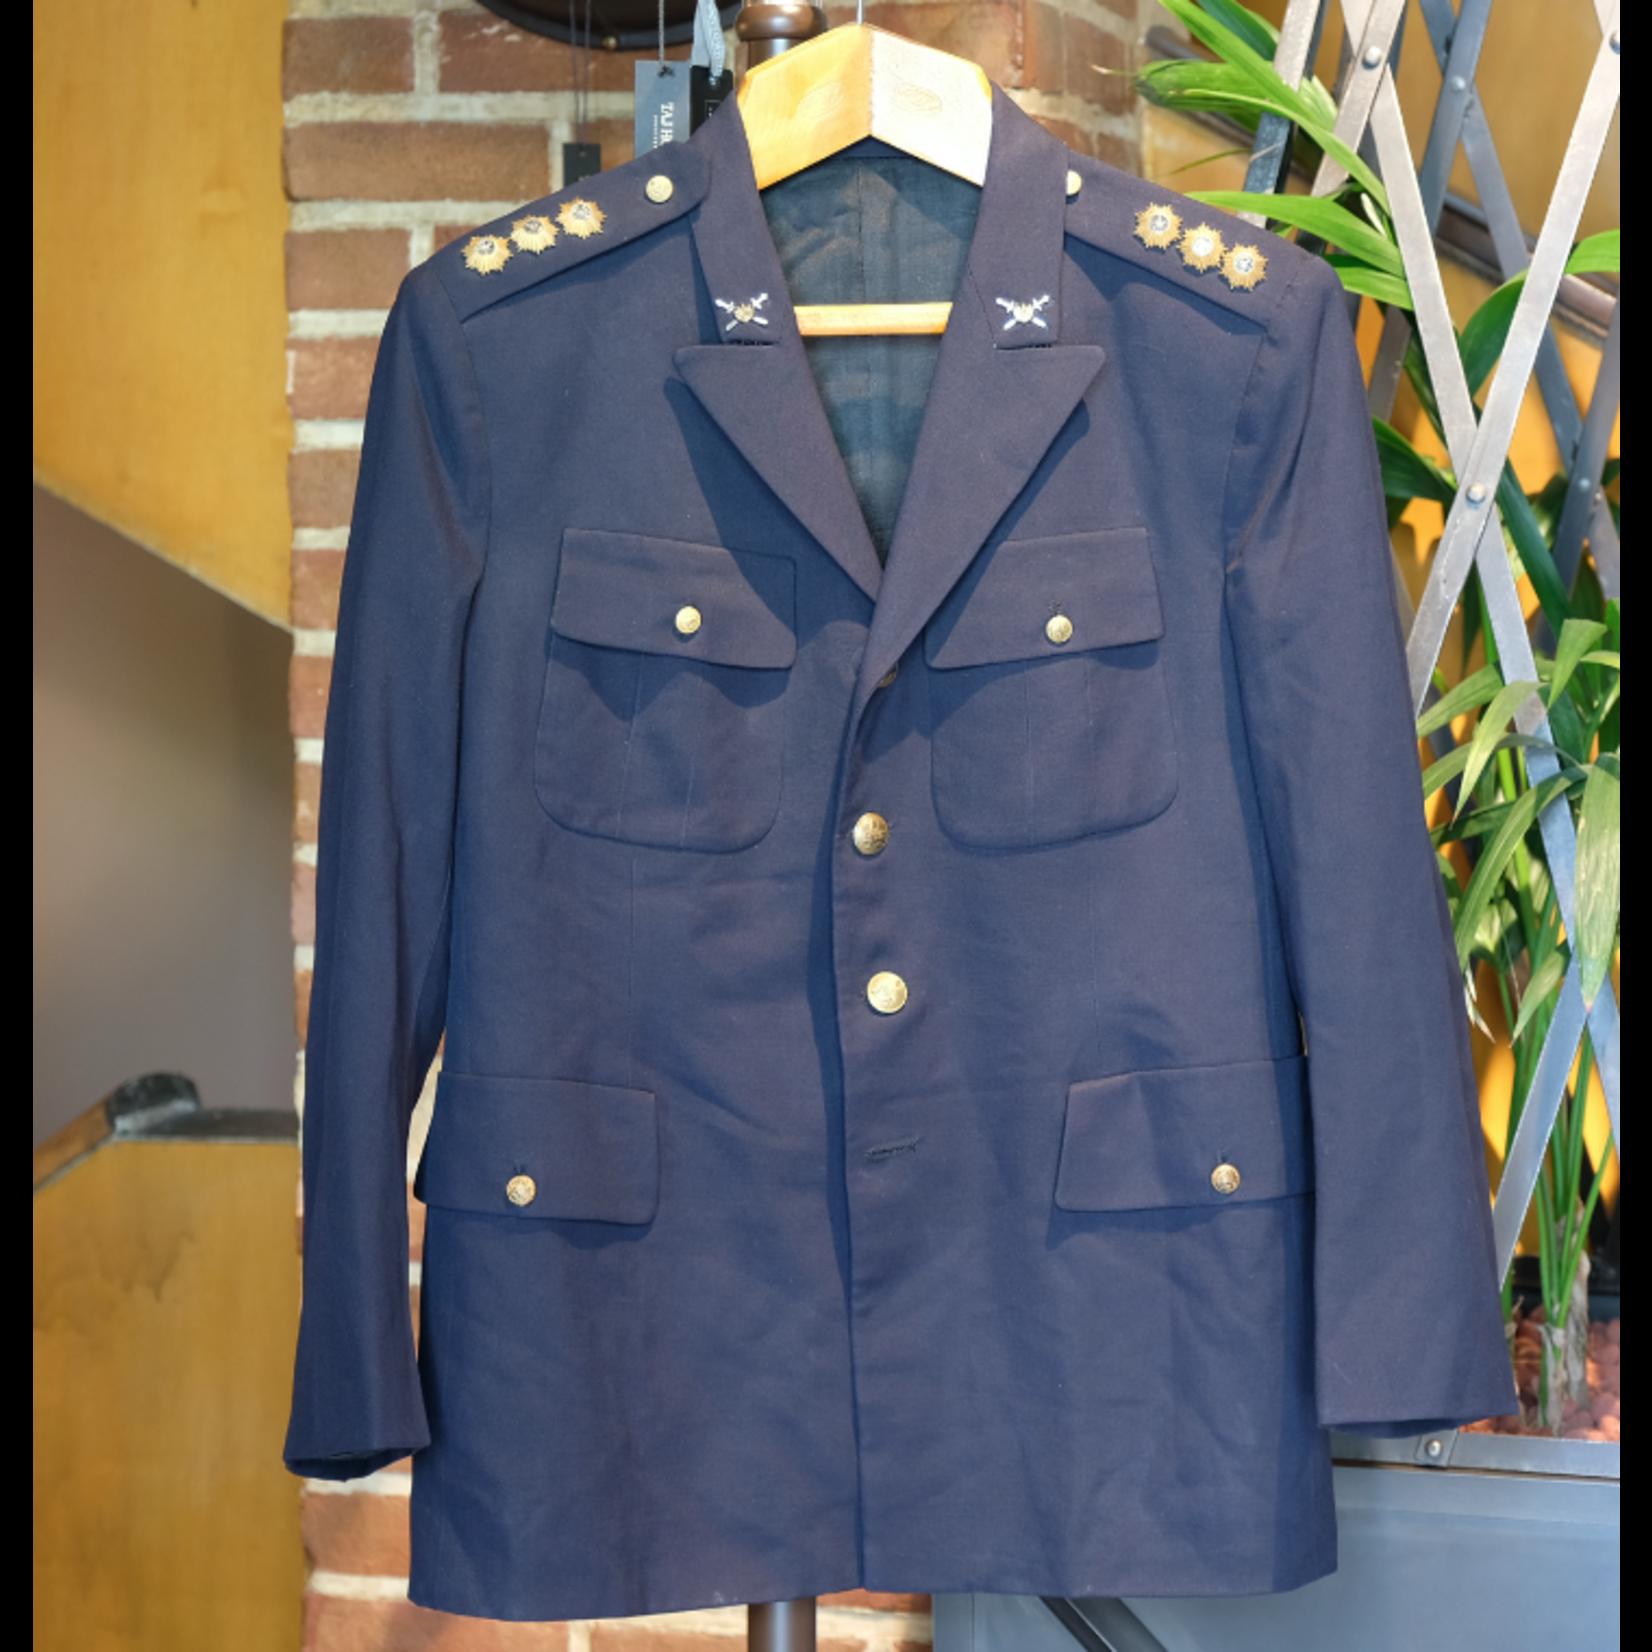 TAJHOME Antique Uniform navy